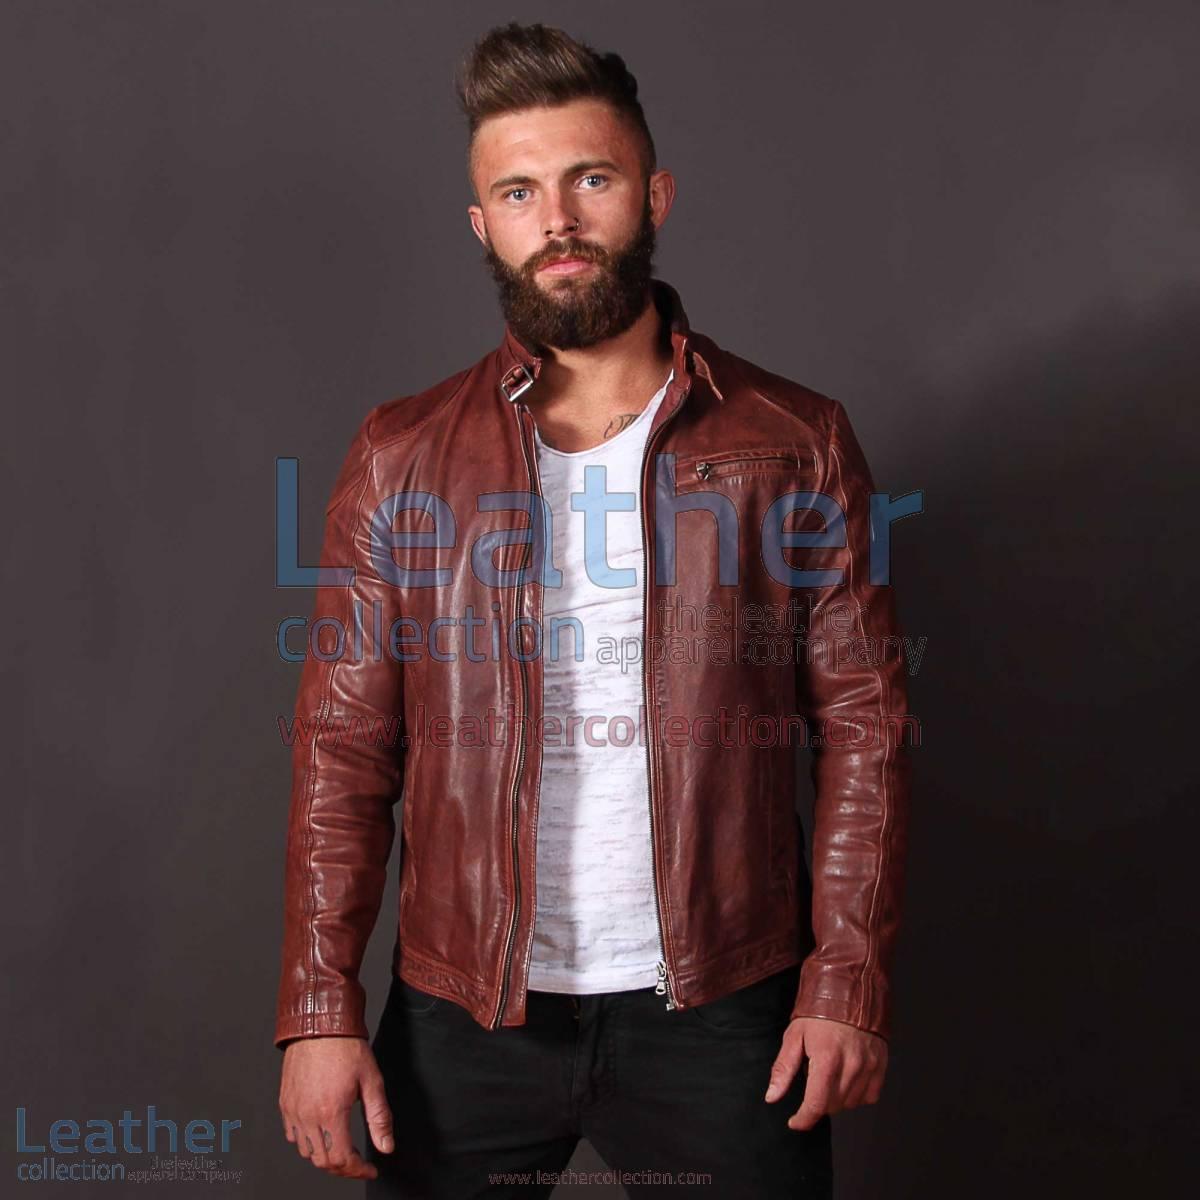 Jazz Leather Jacket for Men